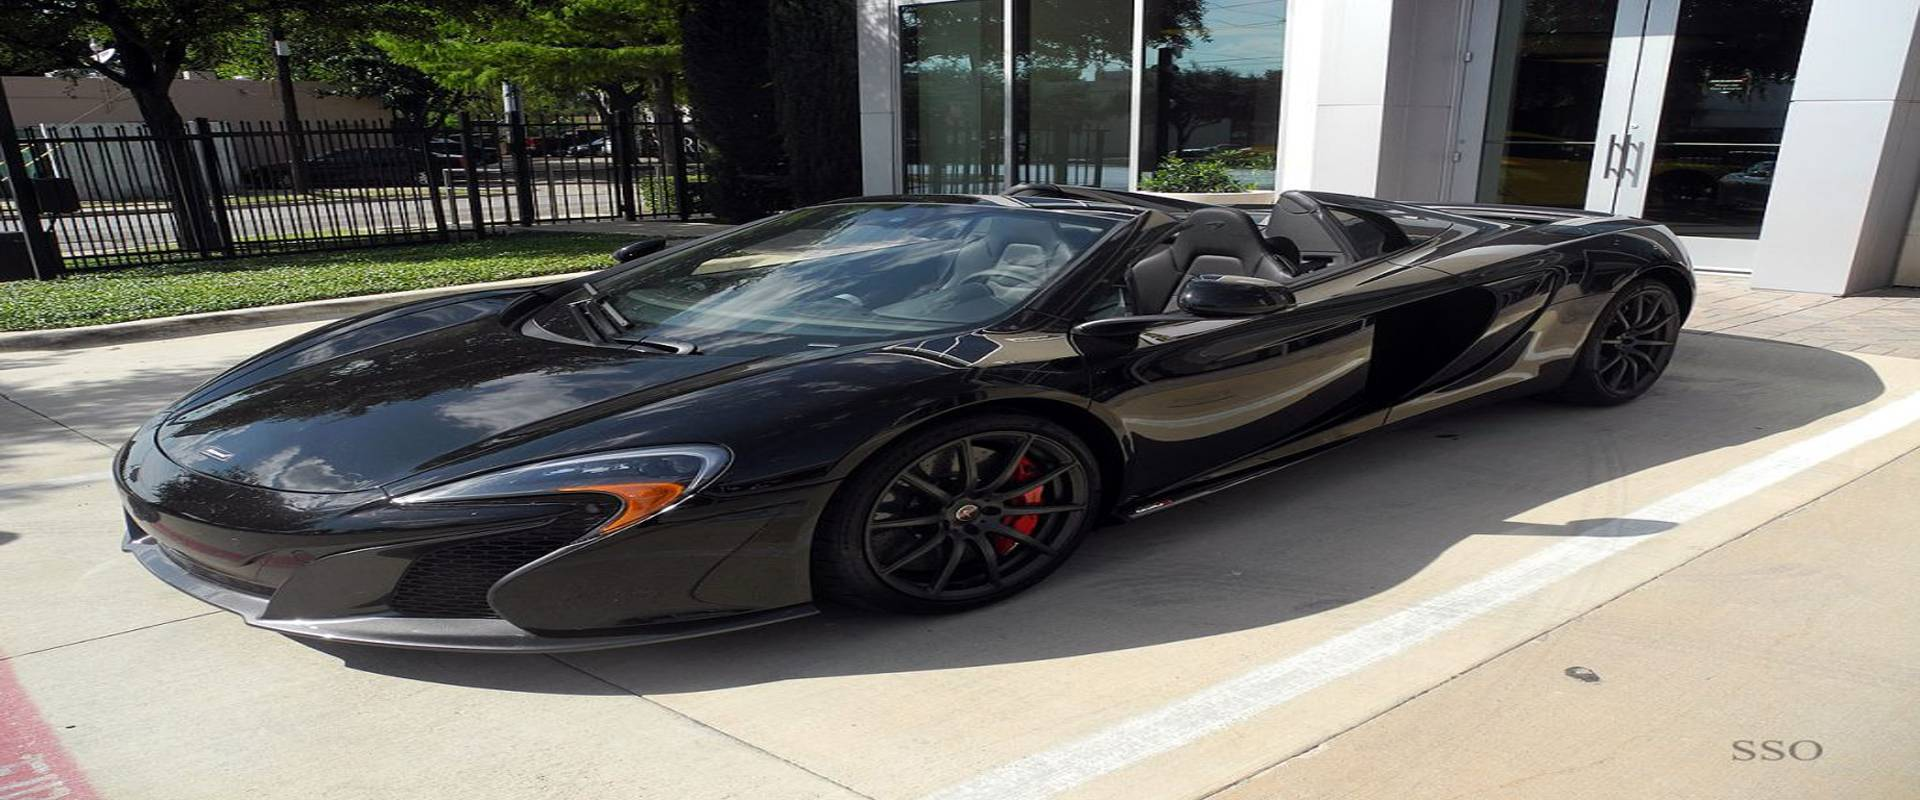 McLaren 650S – Life as a Daily Driver